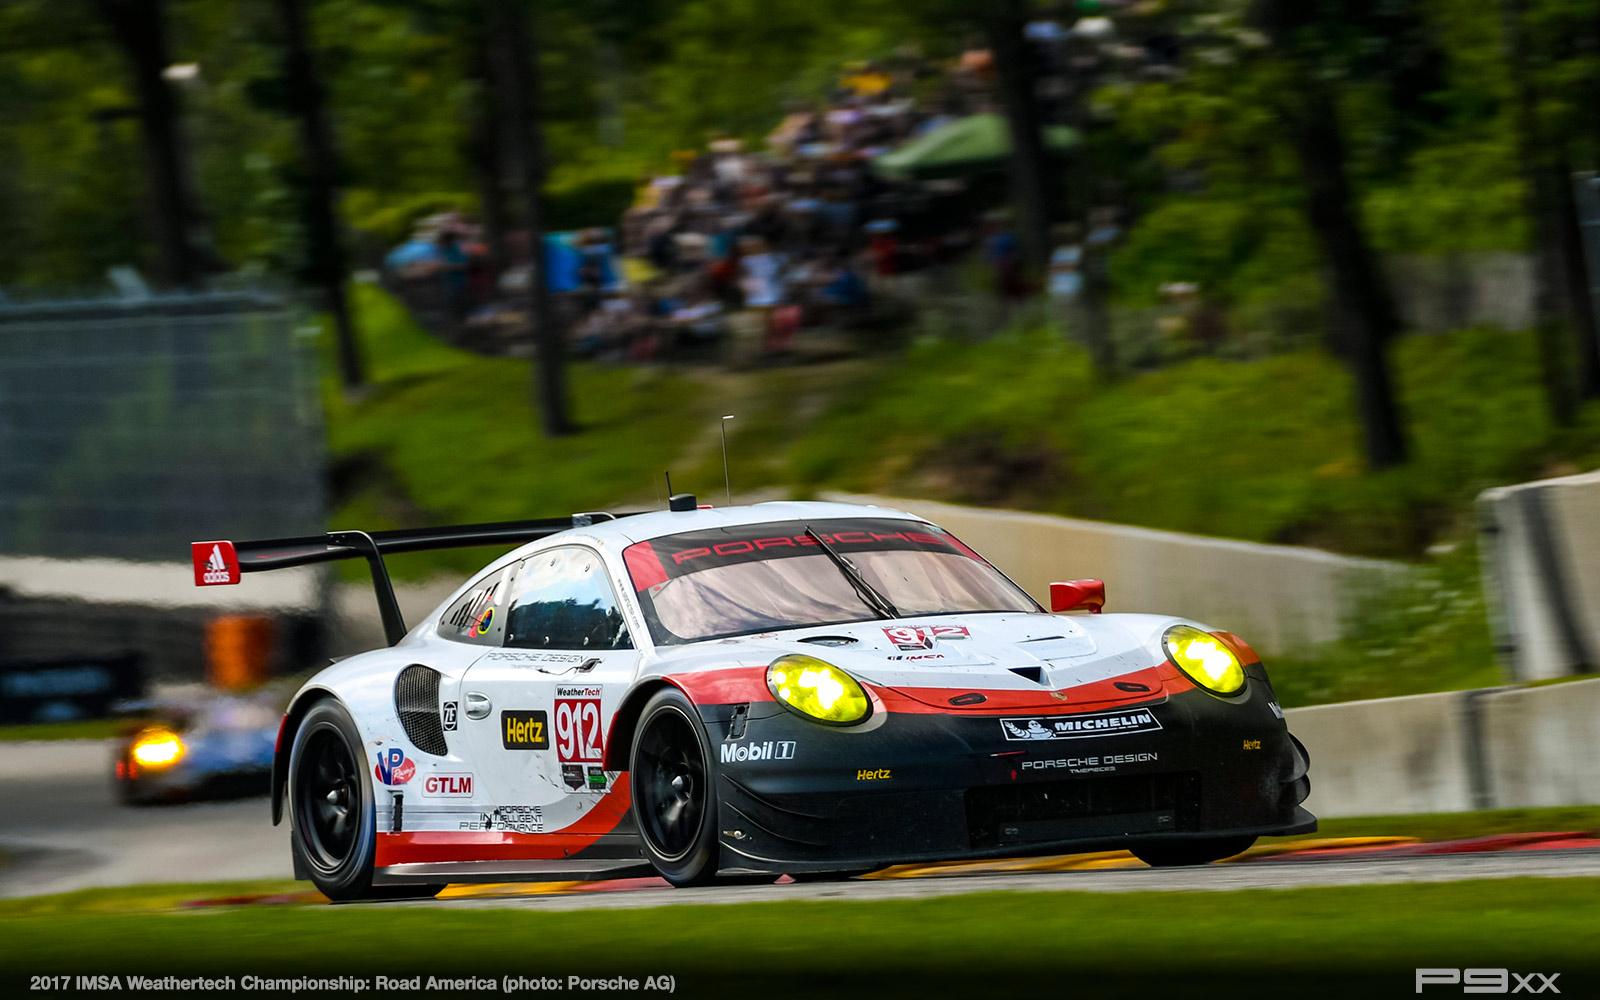 2017-IMSA-Weathertech-Road-America-Porsche-358